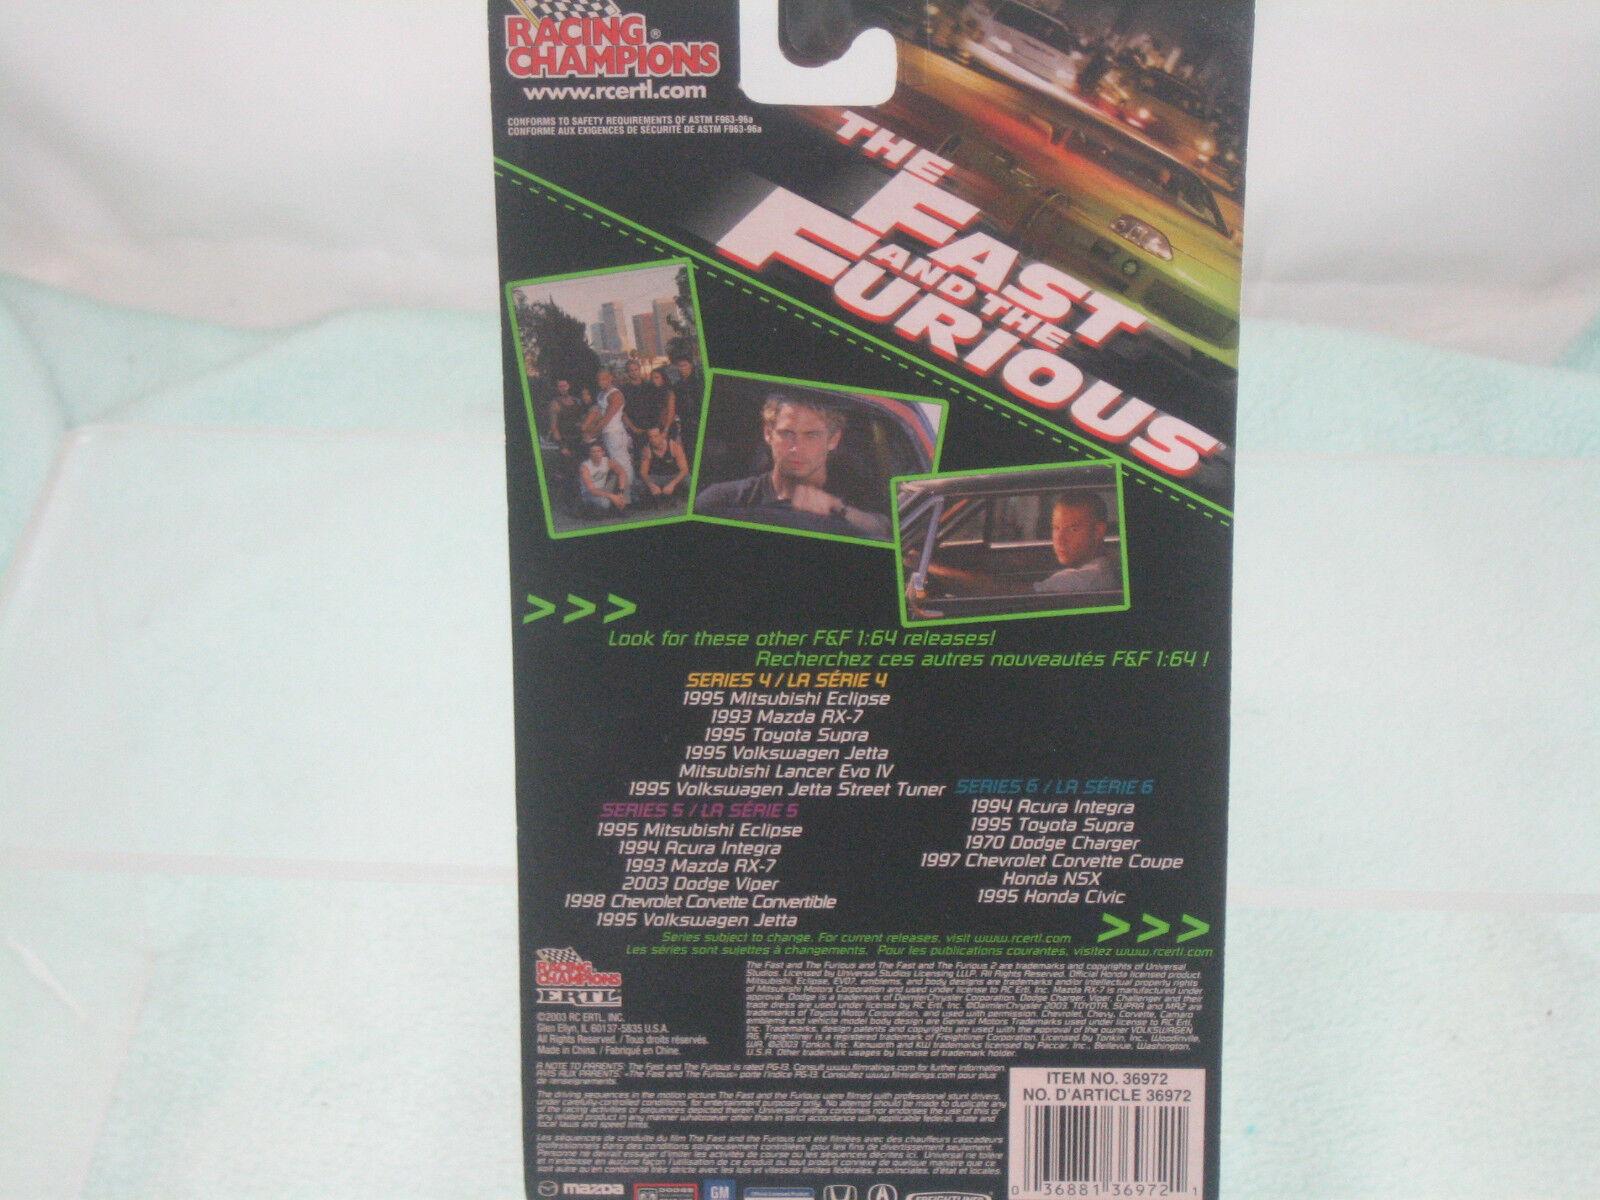 Schnell & the film furious original film the 2003 dodge viper 1 64 db524e